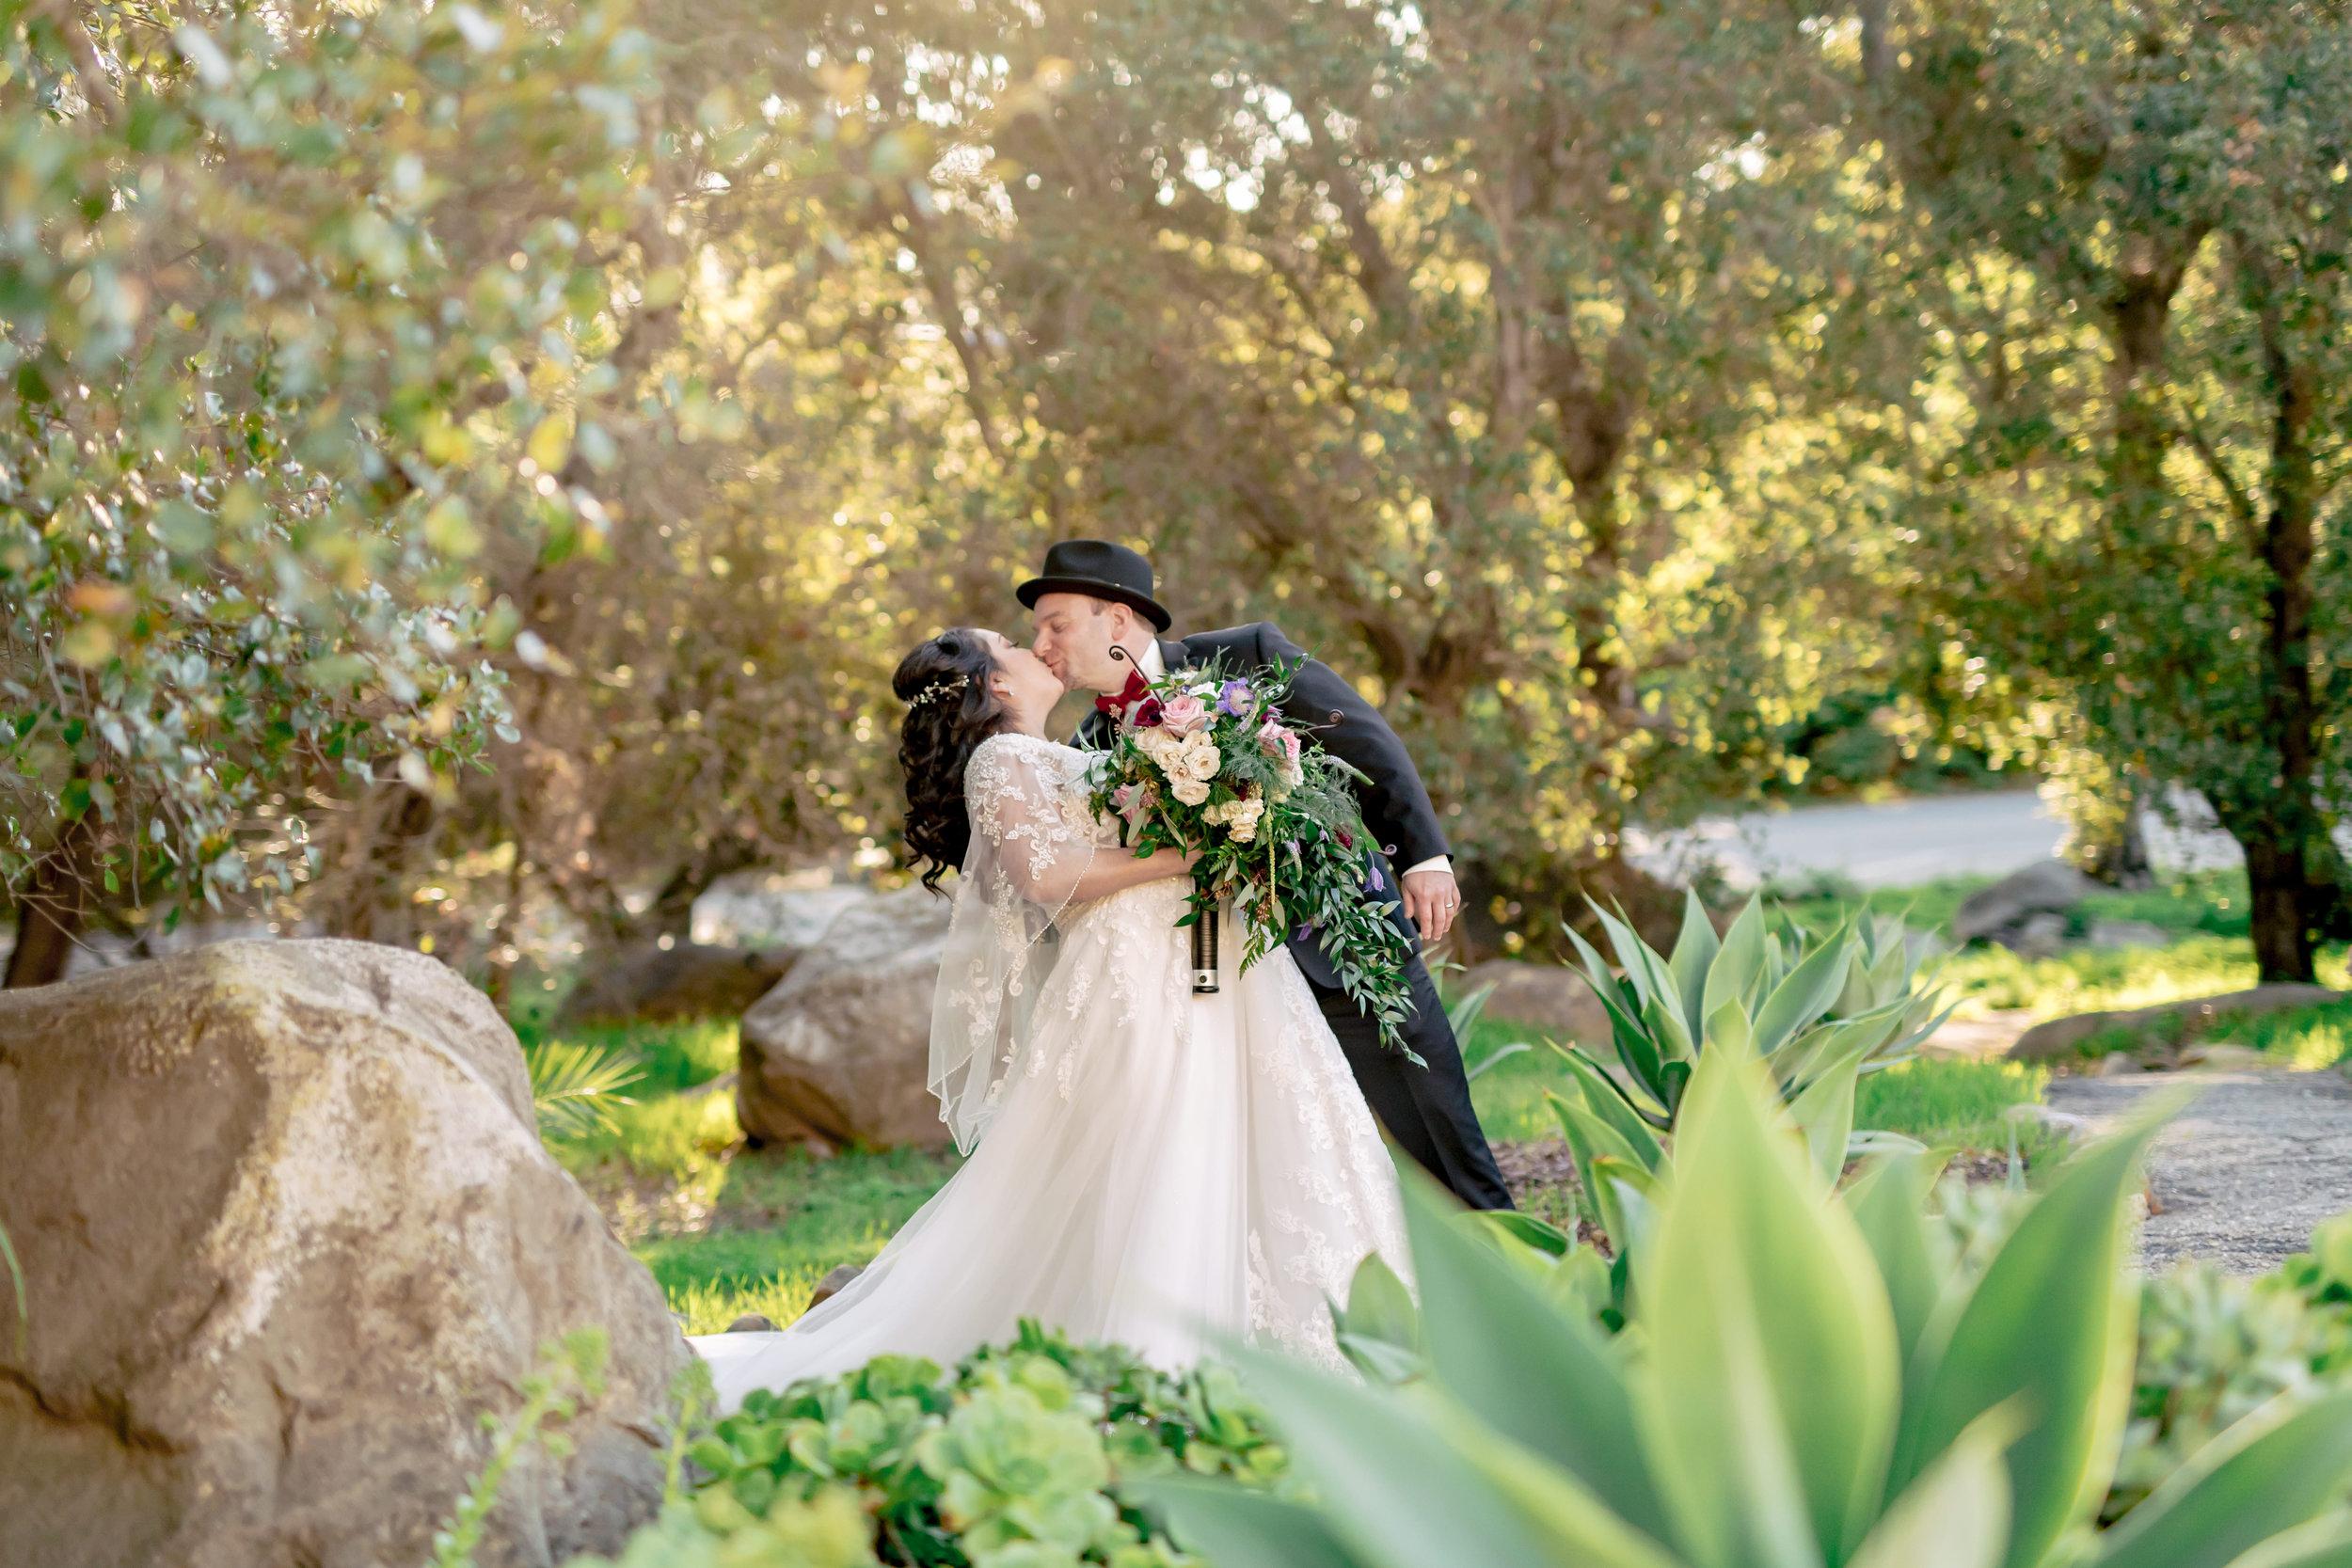 www.santabarbarawedding.com | Rewind Photography | Rockwood Women's Club | Burlap & Bordeaux | Bride and Groom Embrace